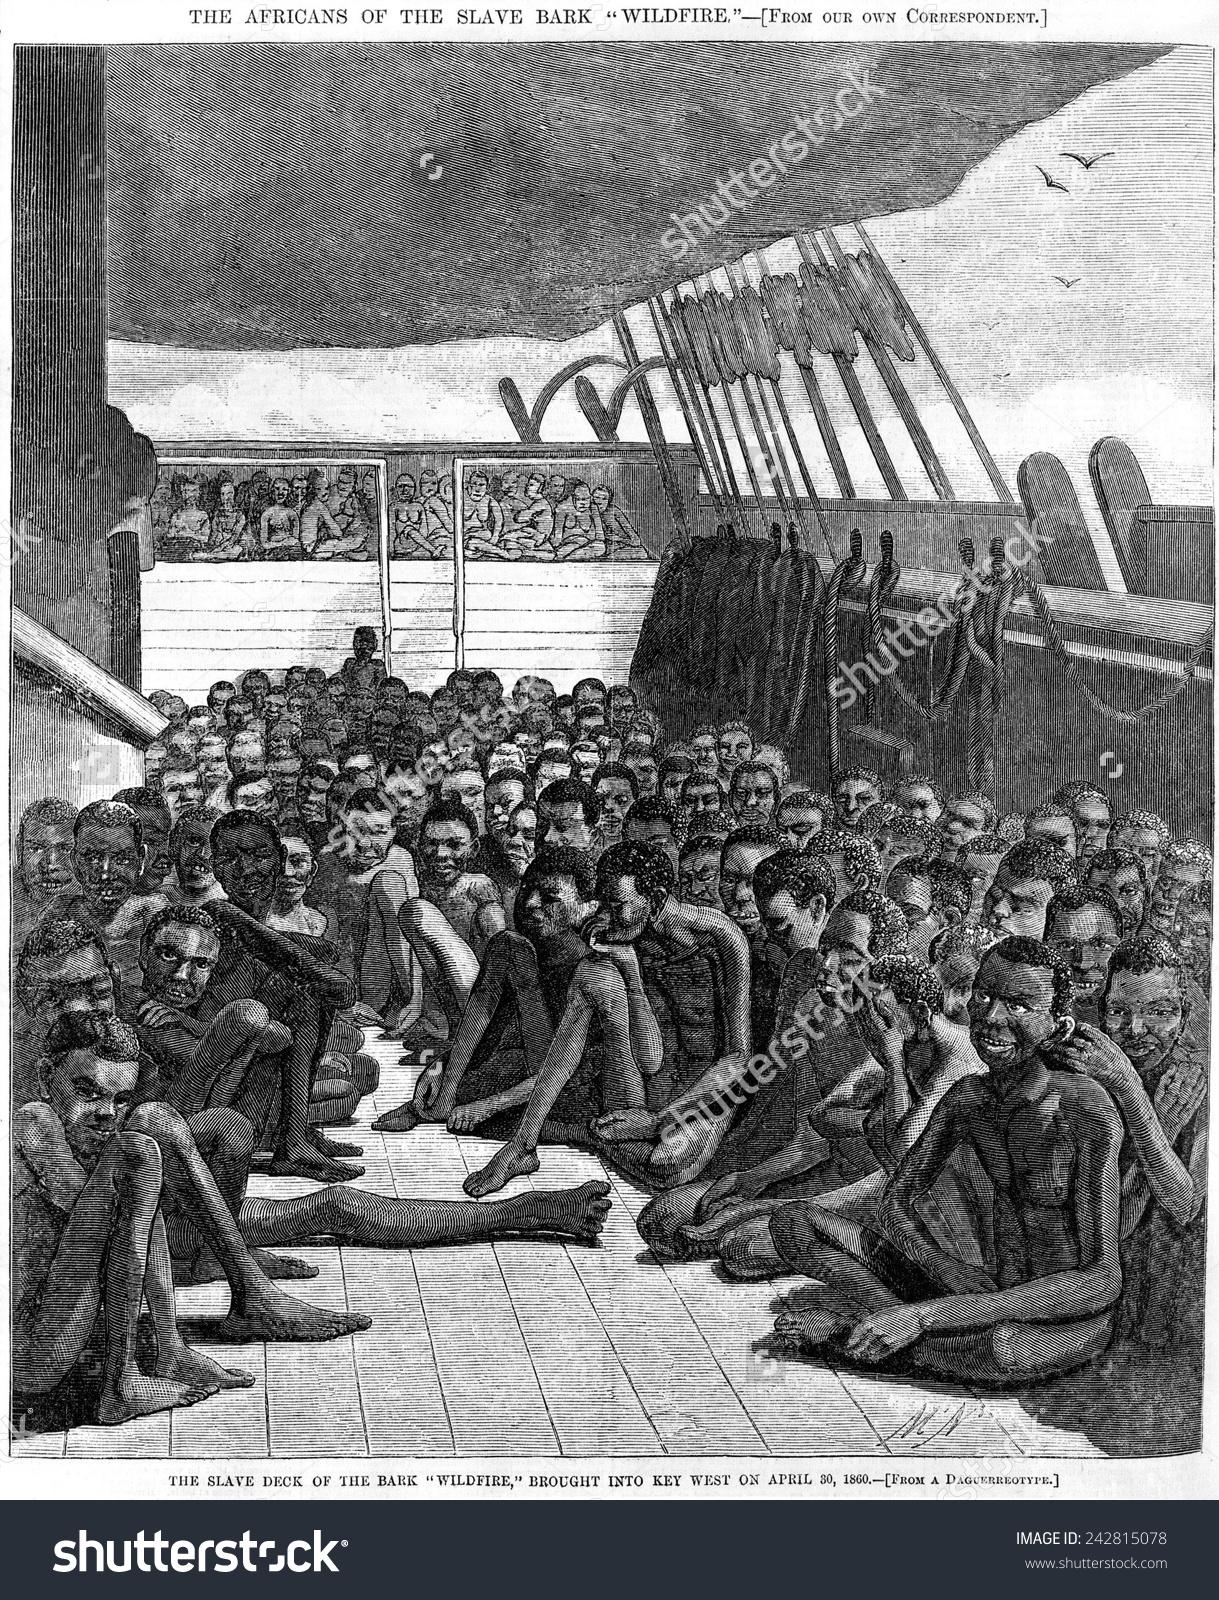 Slave Deck Ship Wildfire Captured Transporting Stock Illustration.